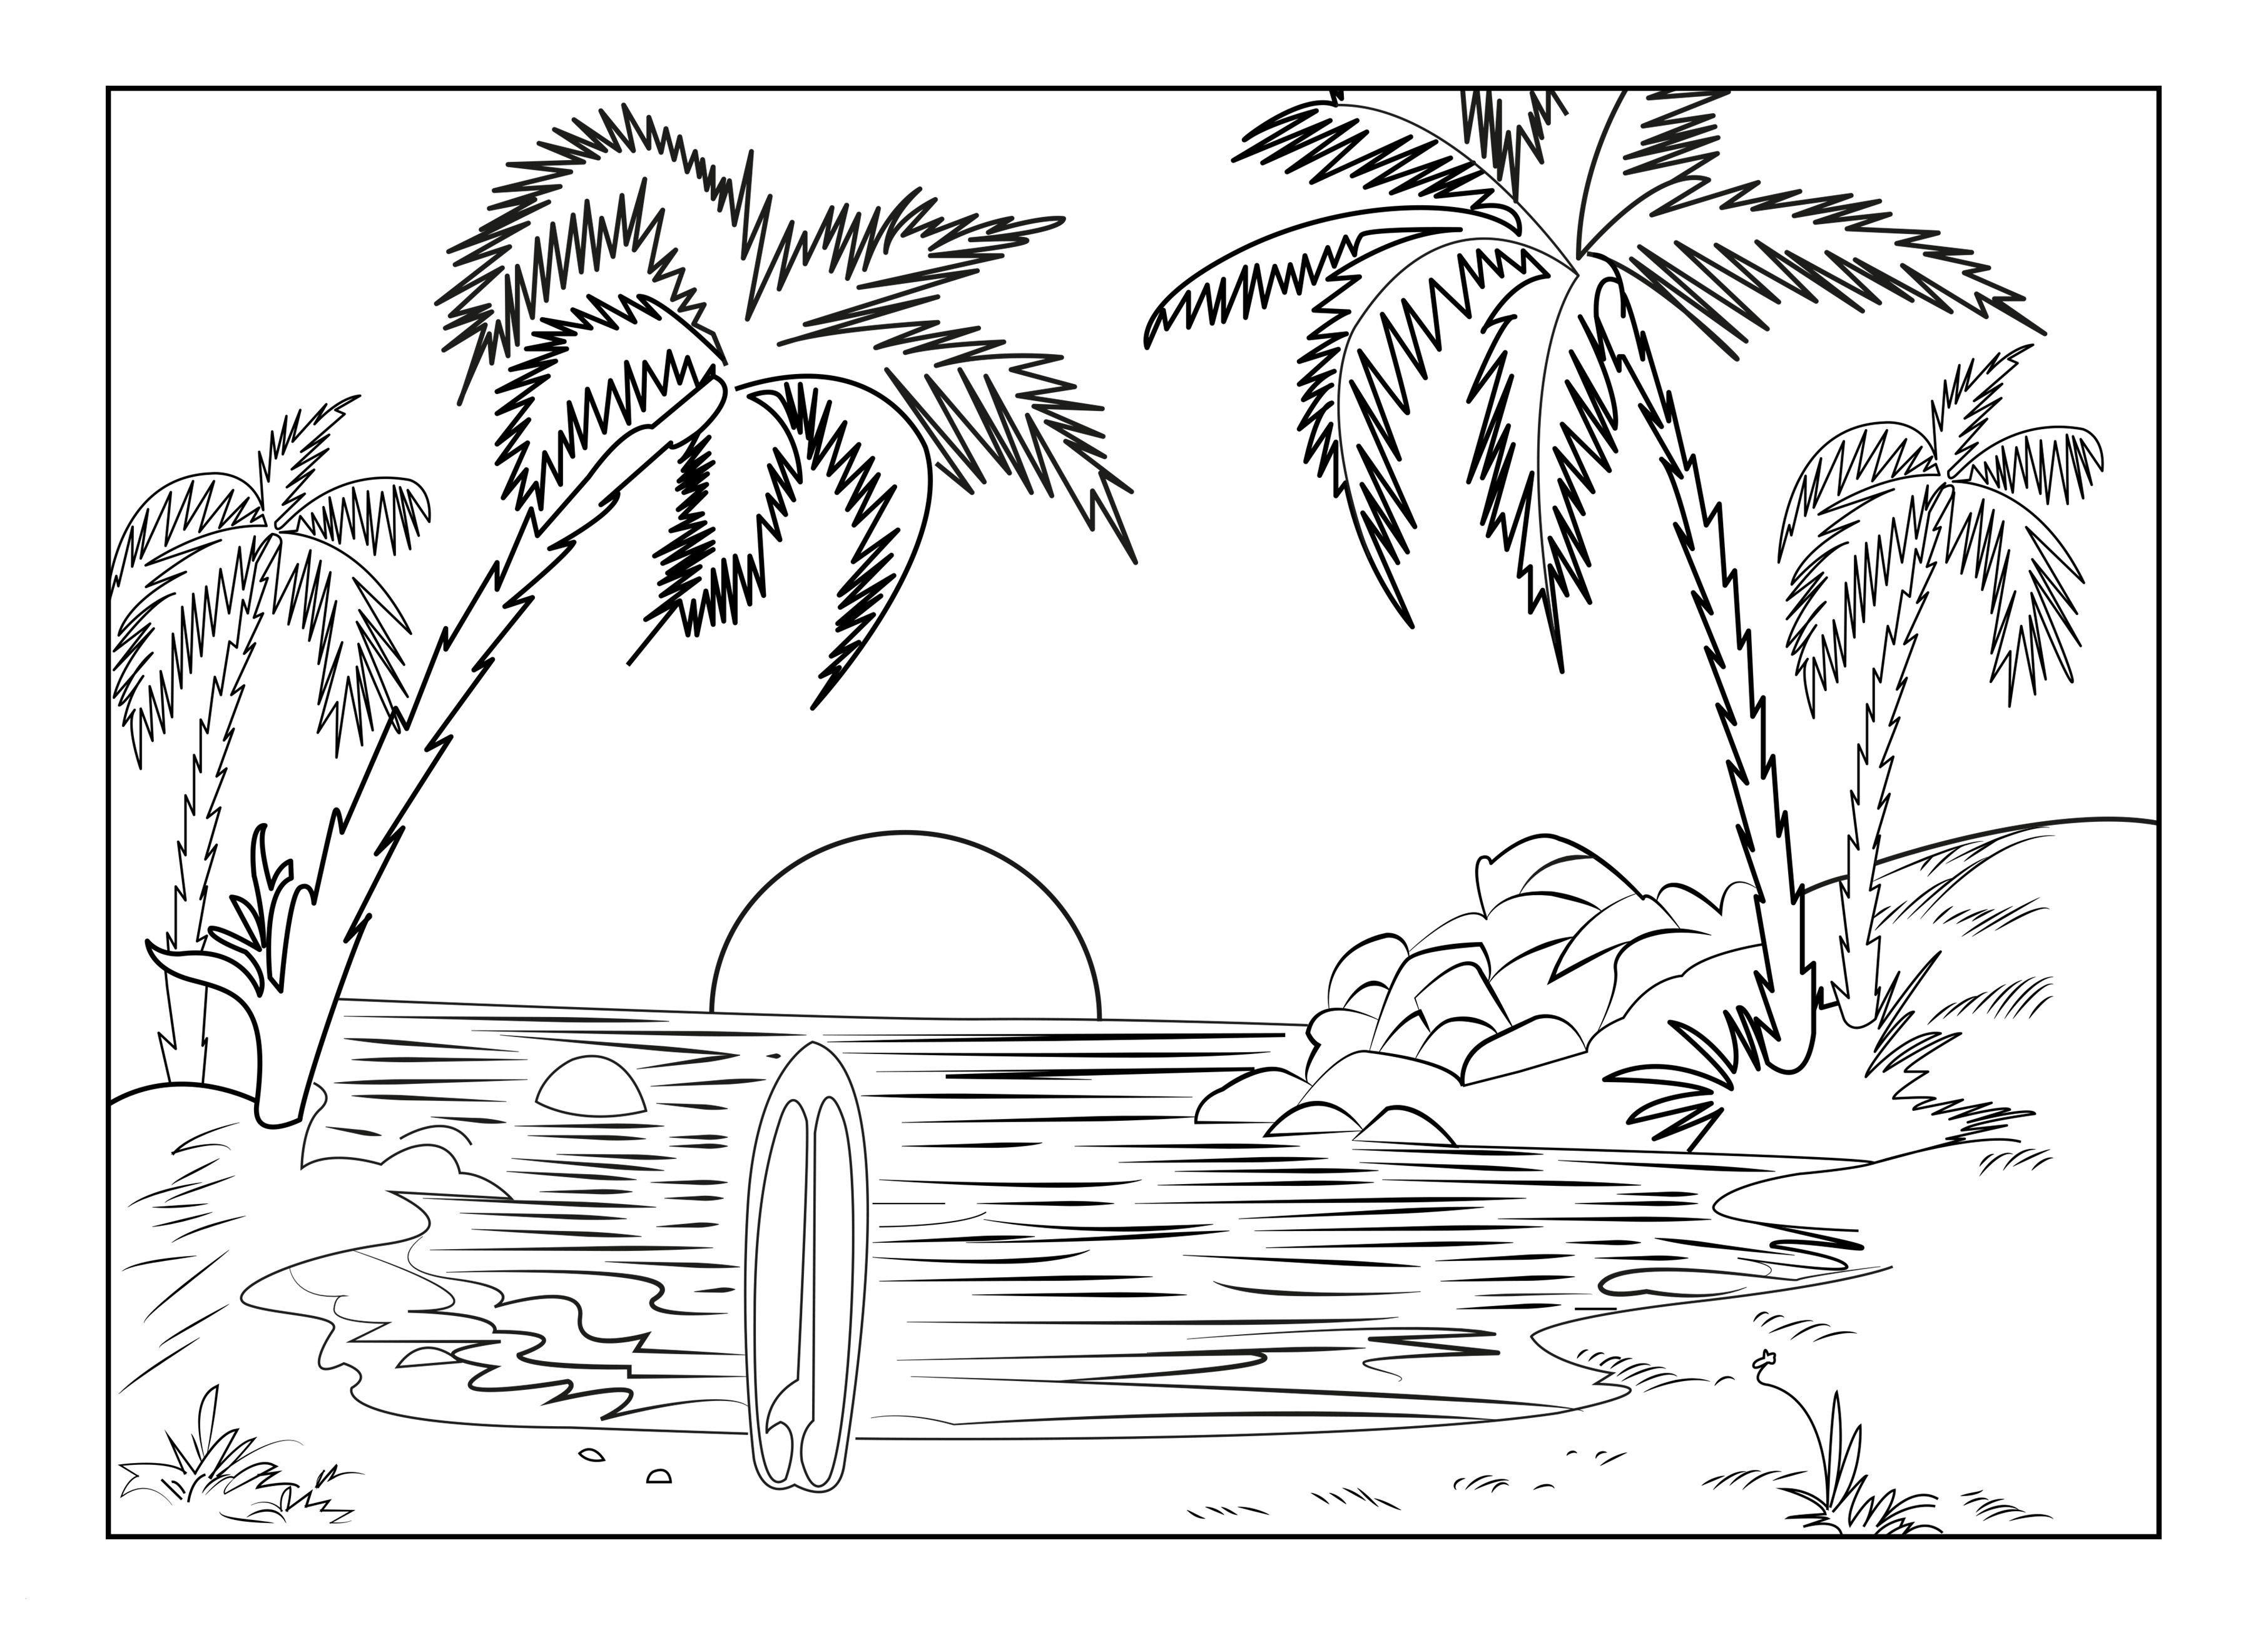 Hundertwasser Bilder Zum Ausmalen Neu Ausmalbilder Hundertwasser Ausmalbuchstabenore Fotos